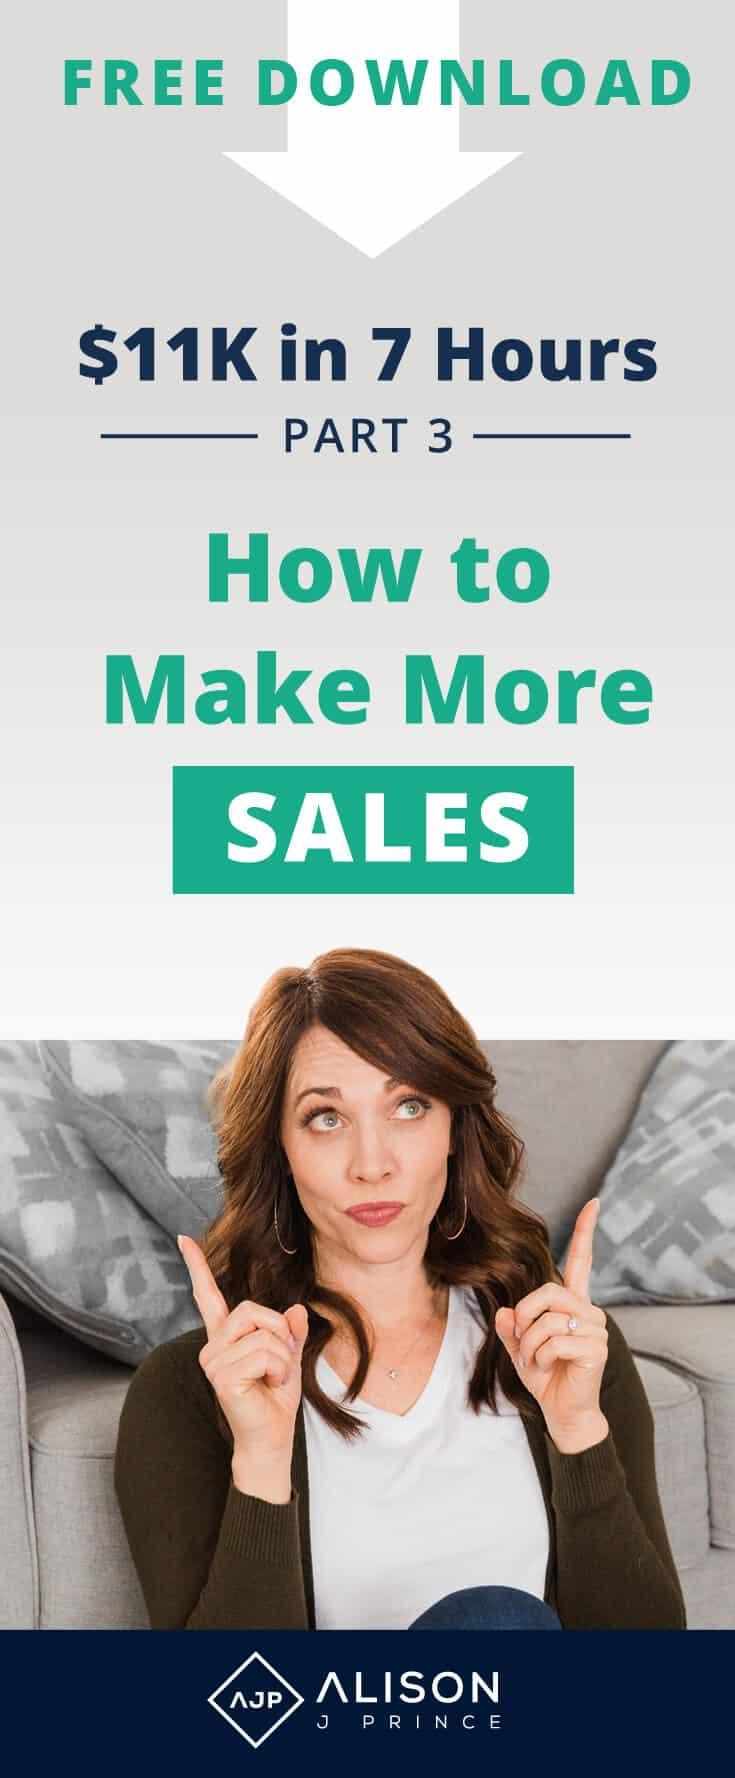 Alison Prince, Make More Online Sales, Ecommerce, Online Store